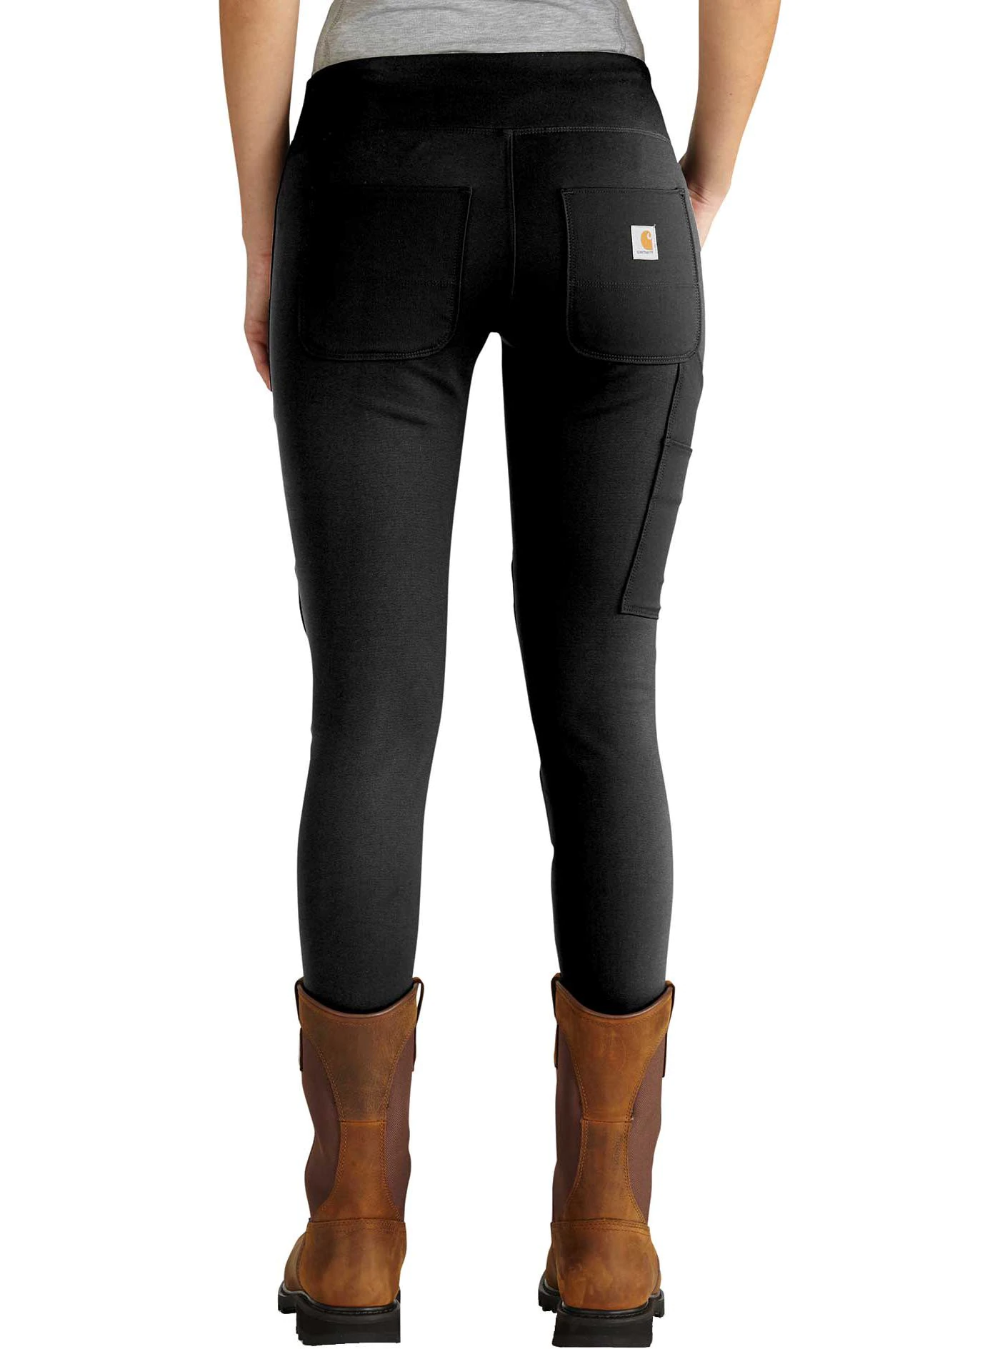 Carhartt Women's Force Utility Knit Leggings | DICK'S Sporting Goods #carharttwomen